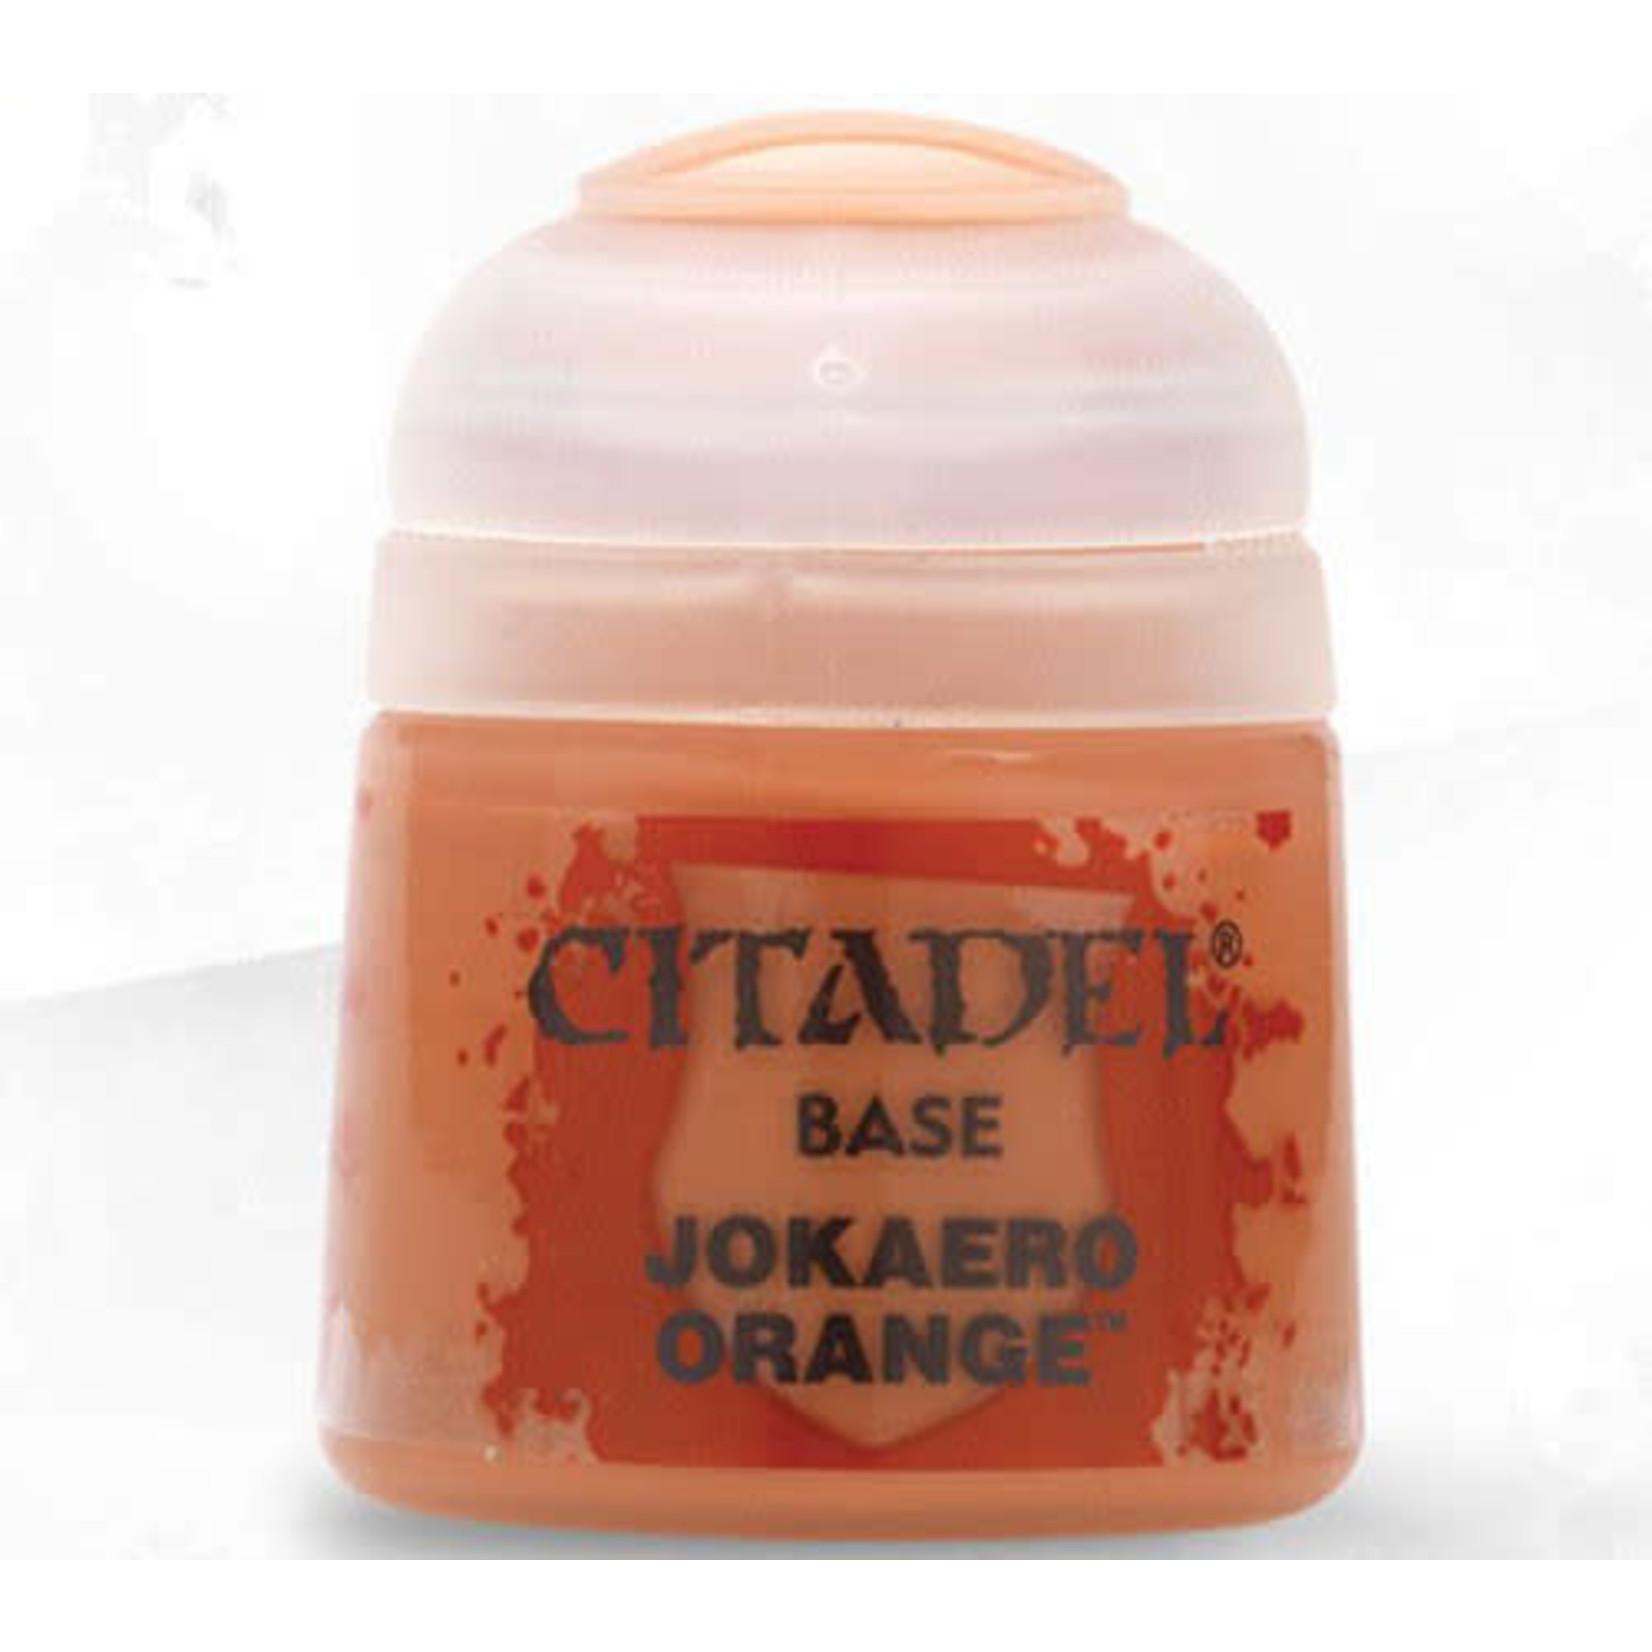 Citadel Citadel Paint - Base: Jokaero Orange